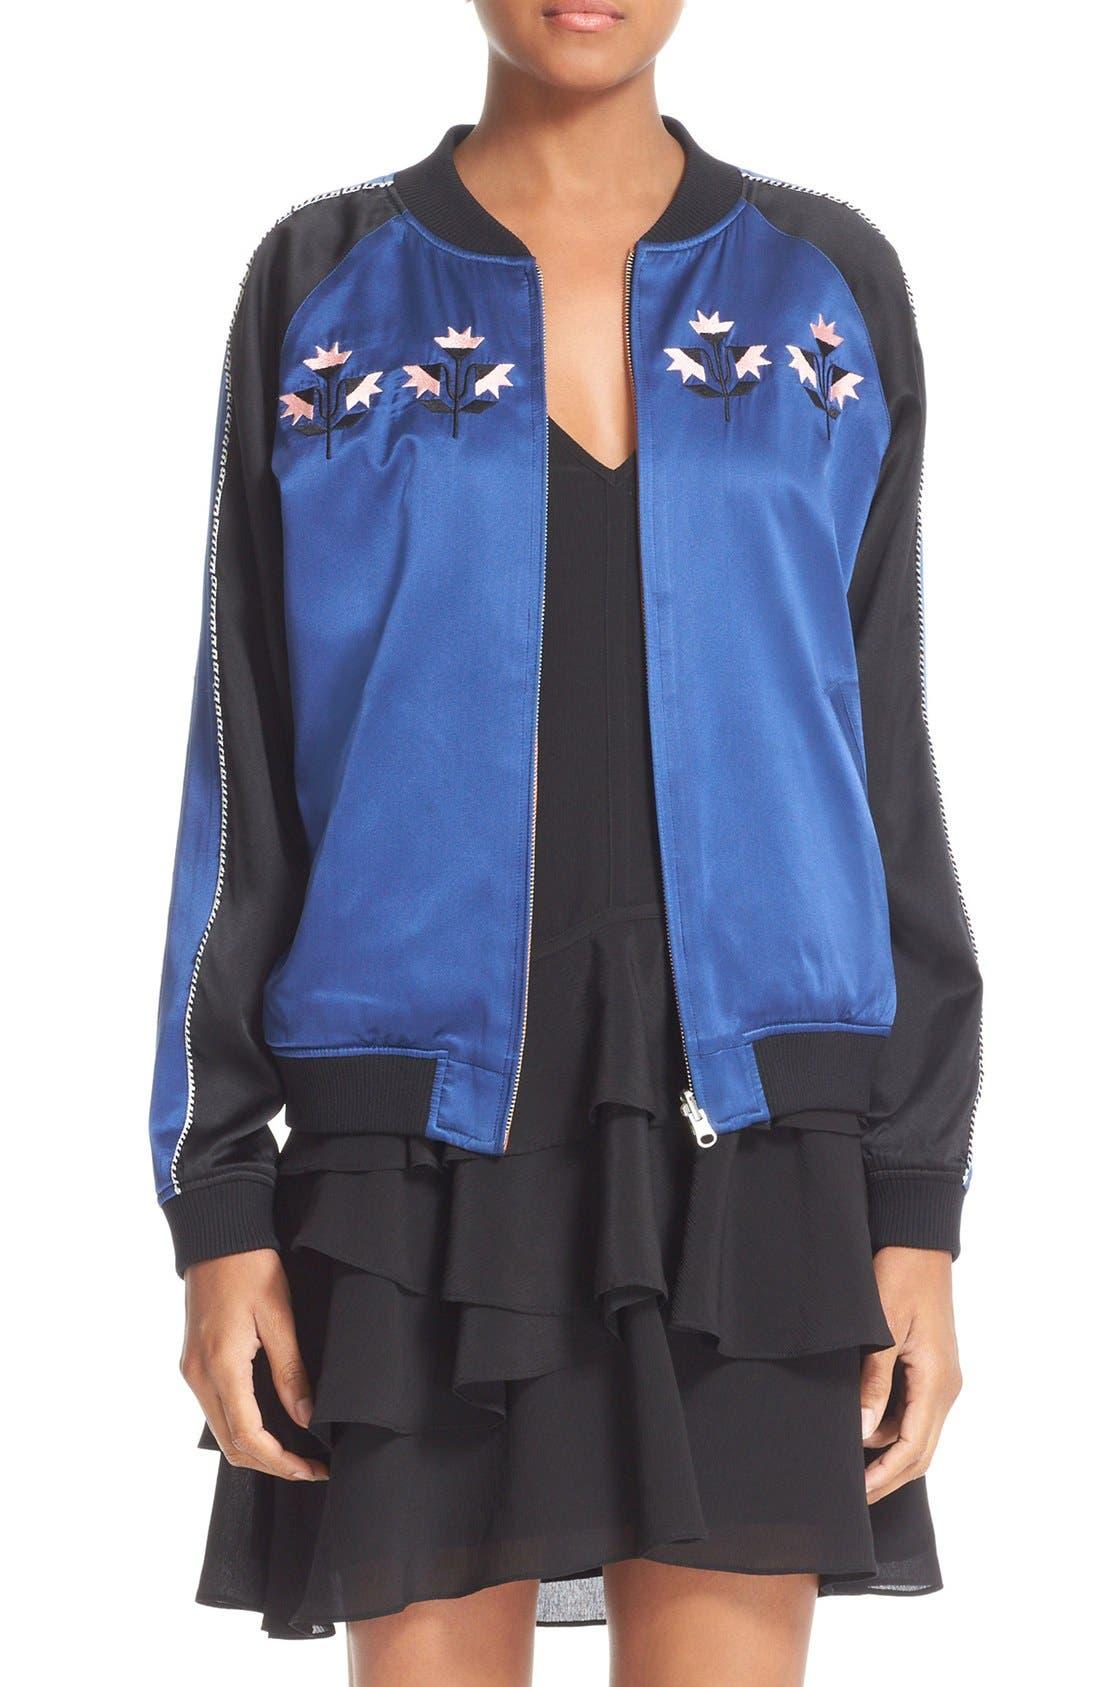 Main Image - Opening Ceremony Reversible Embroidered Silk Bomber Jacket